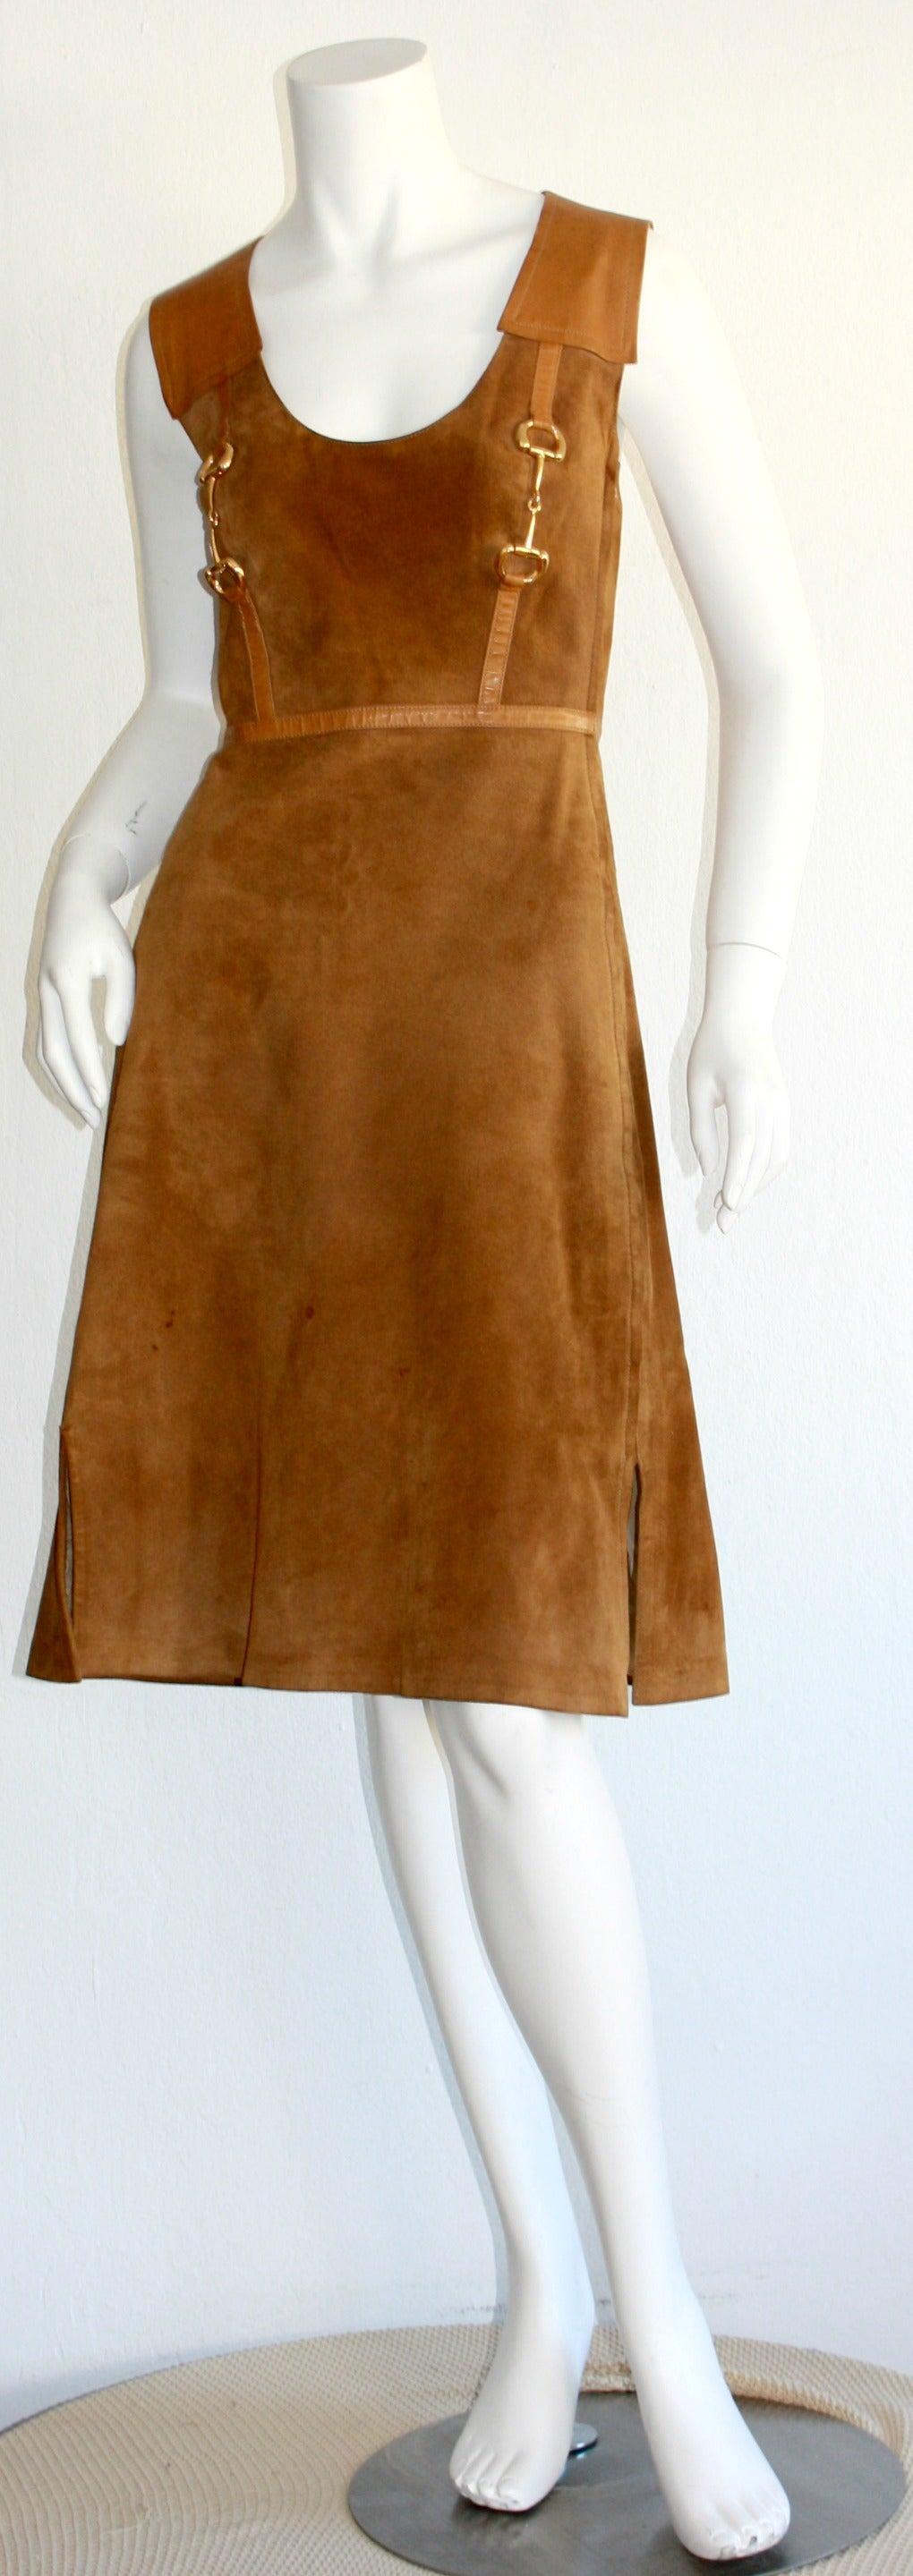 Rare Vintage 1960s Gucci Tan Leather Horsebit A - Line Space Age Dress 3